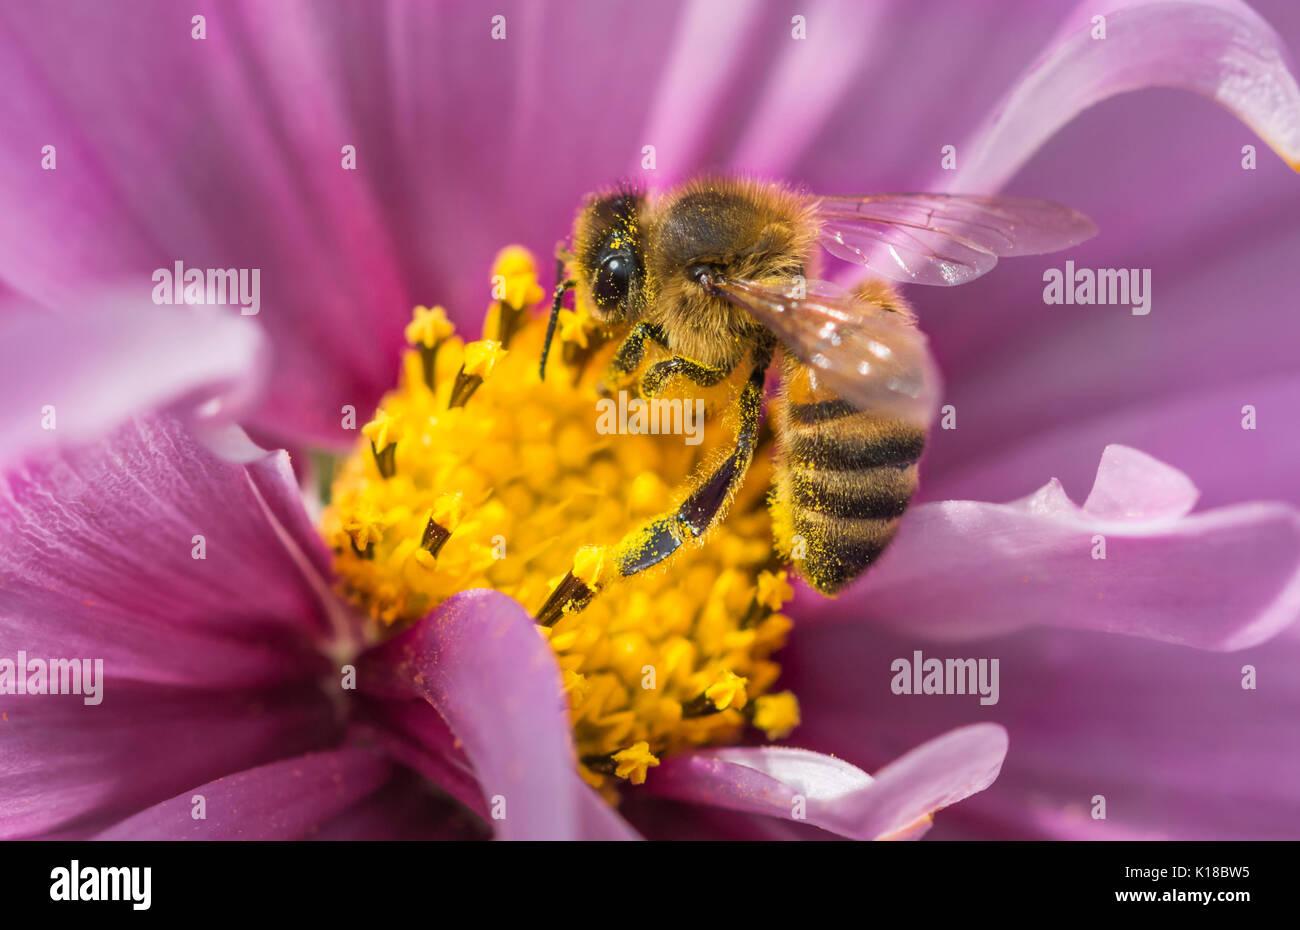 Macro de miel de abeja europea (Apis mellifera) en un Cosmos bipinnatus (México) flor aster recogidas néctar / polinizando, en West Sussex, Inglaterra, Reino Unido. Foto de stock